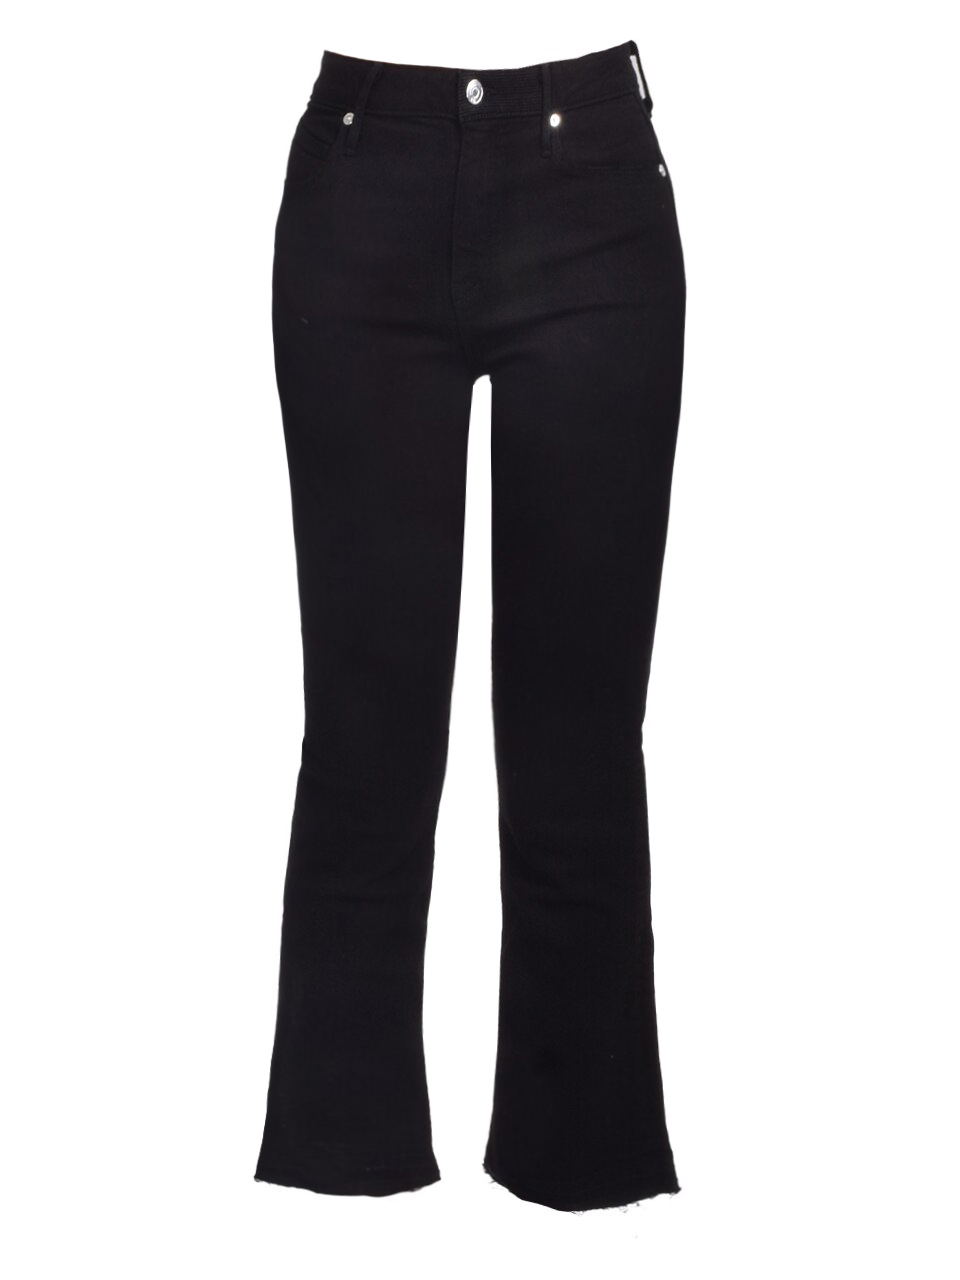 RtA Brandi Jeans in Max Black Product Shot